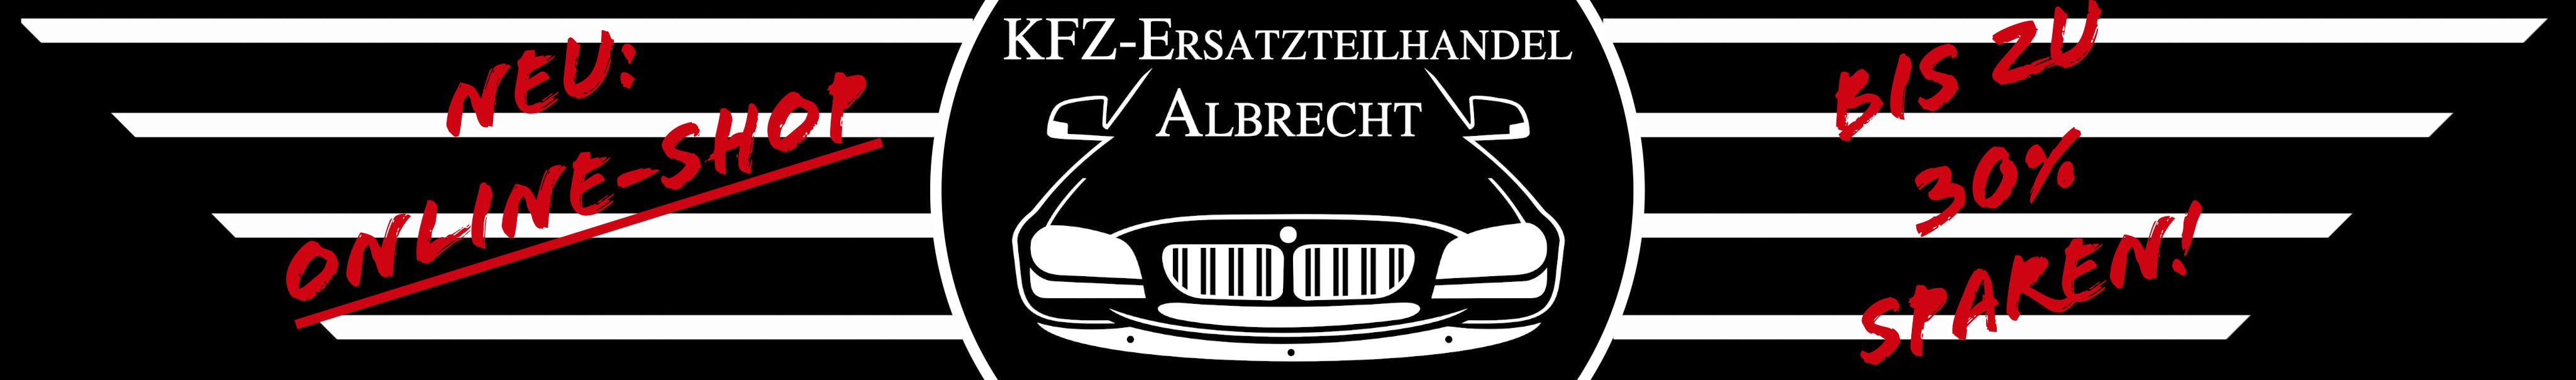 Ersatzteilhandel Albrecht